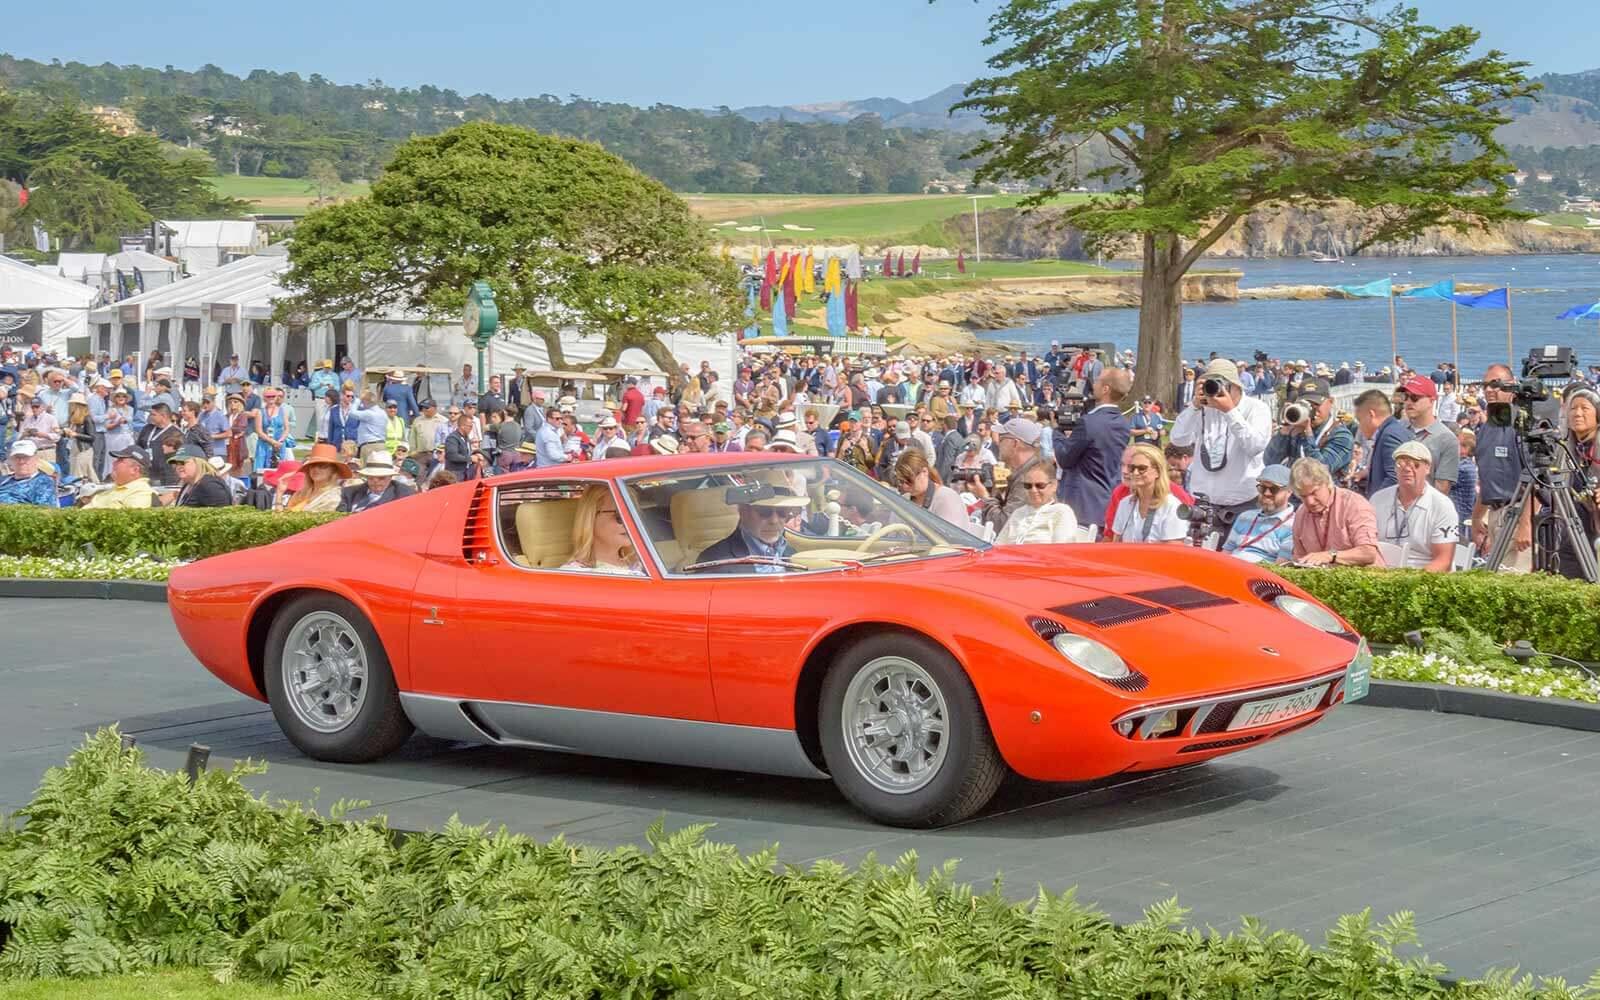 1968 Lamborghini Miura Bertone Coupé